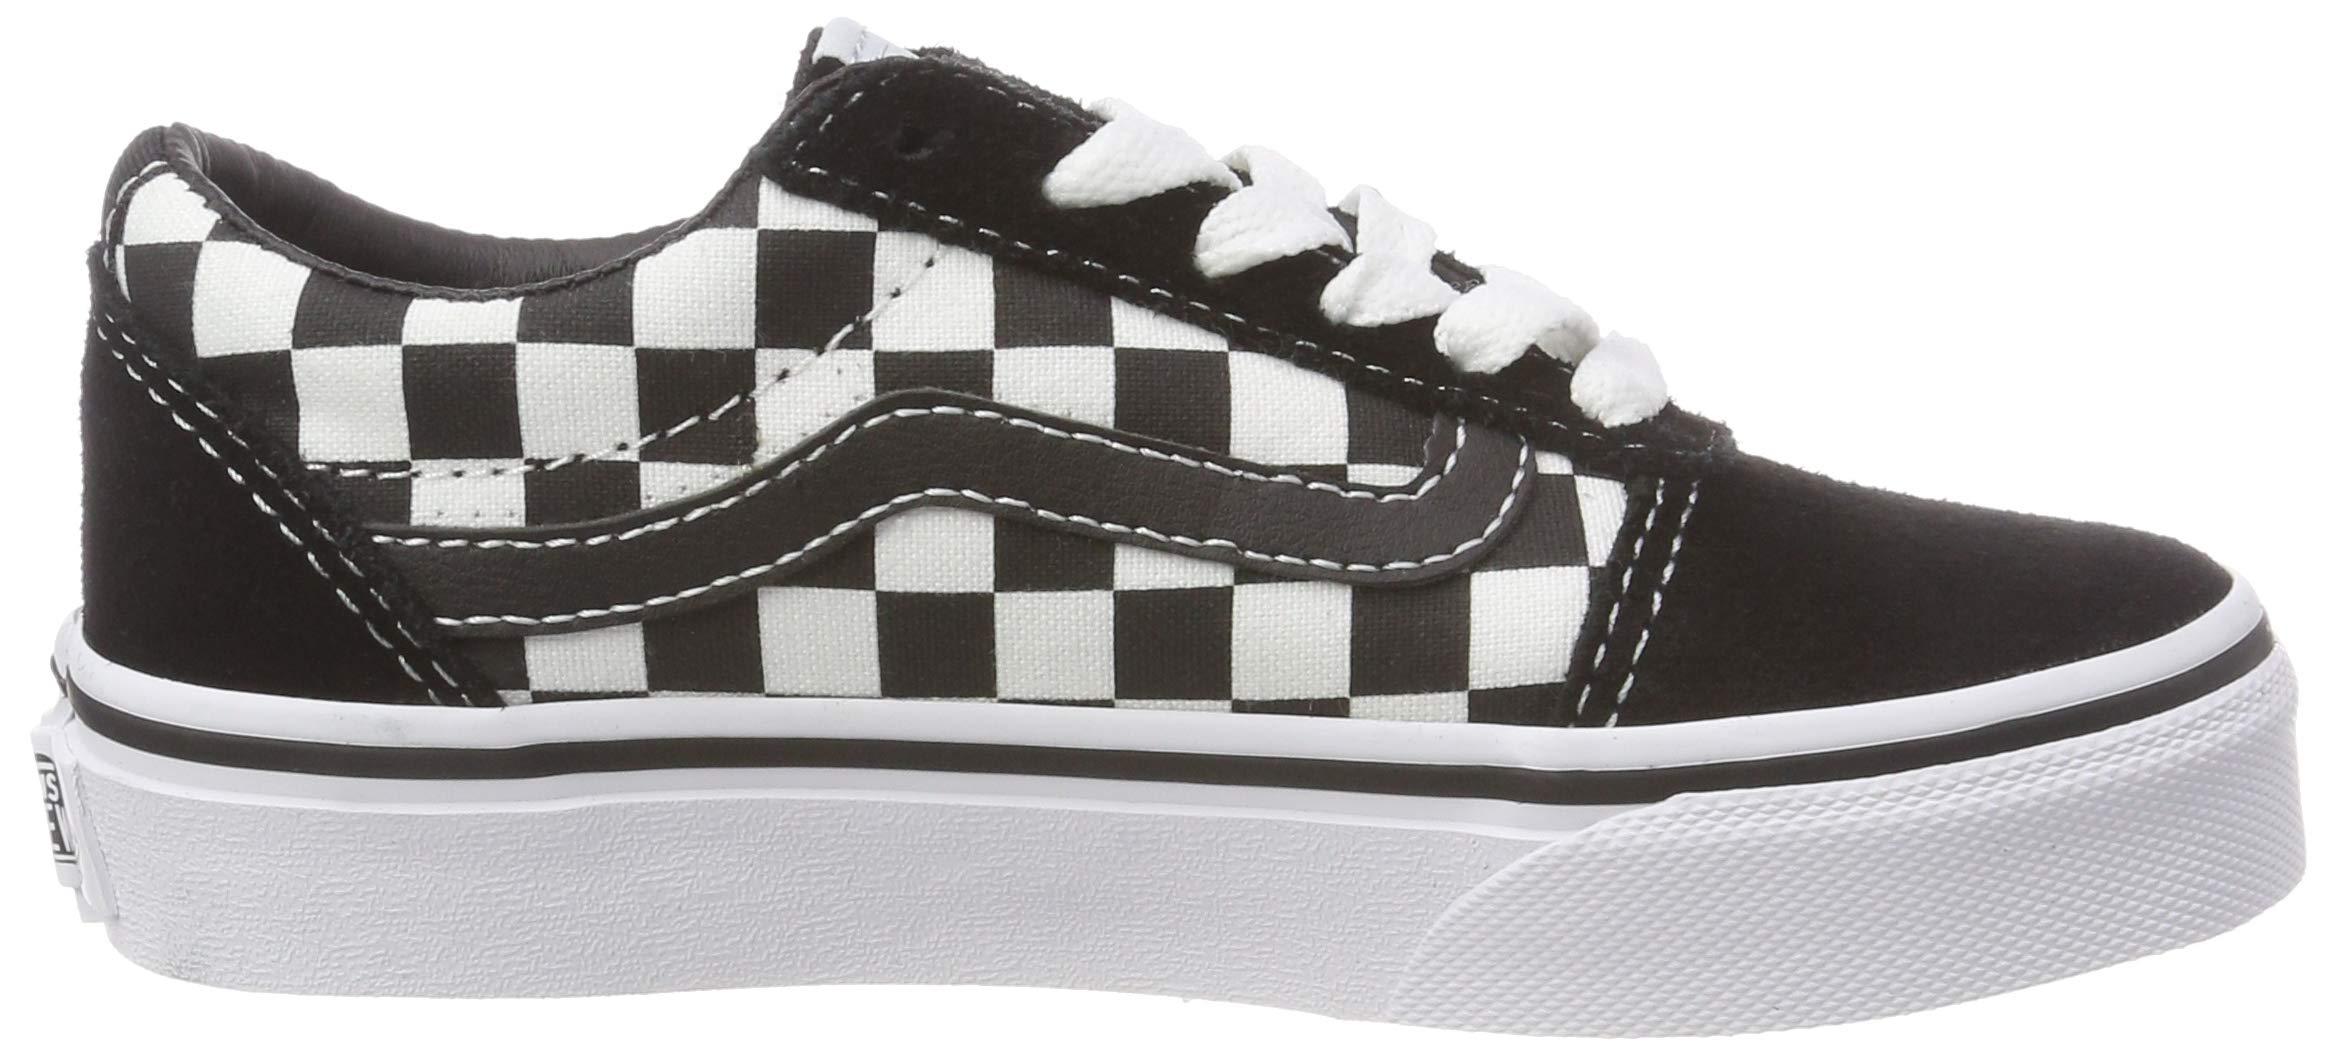 24ba70b219e150 Vans Kids  Ward Suede Canvas Low-Top Sneakers – Shoes Just Shoes UK